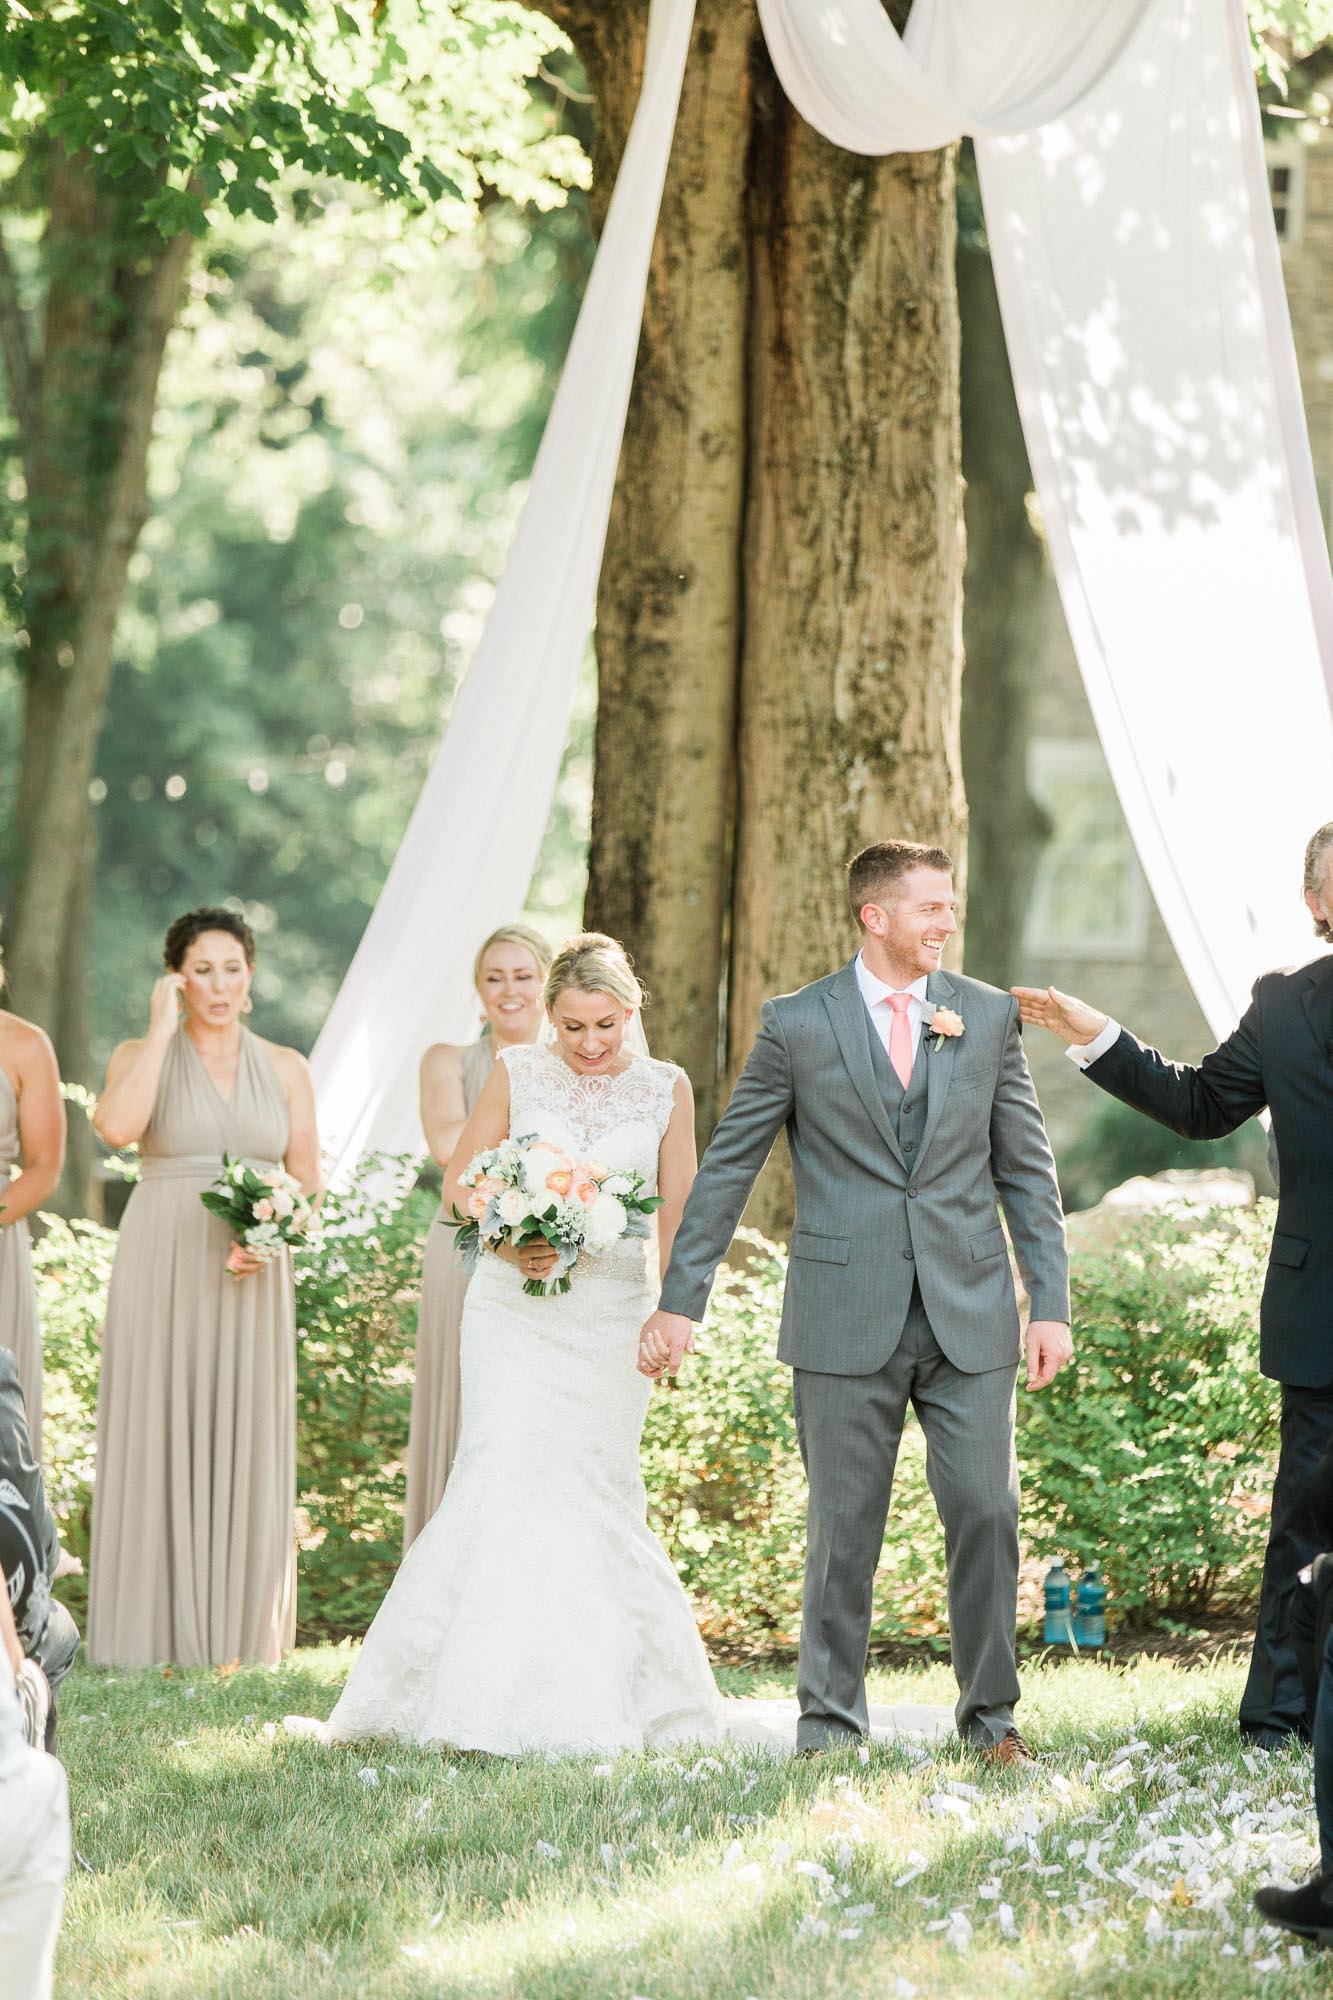 Allenberry-resort-historic-pennsylvania-wedding-22167.jpg